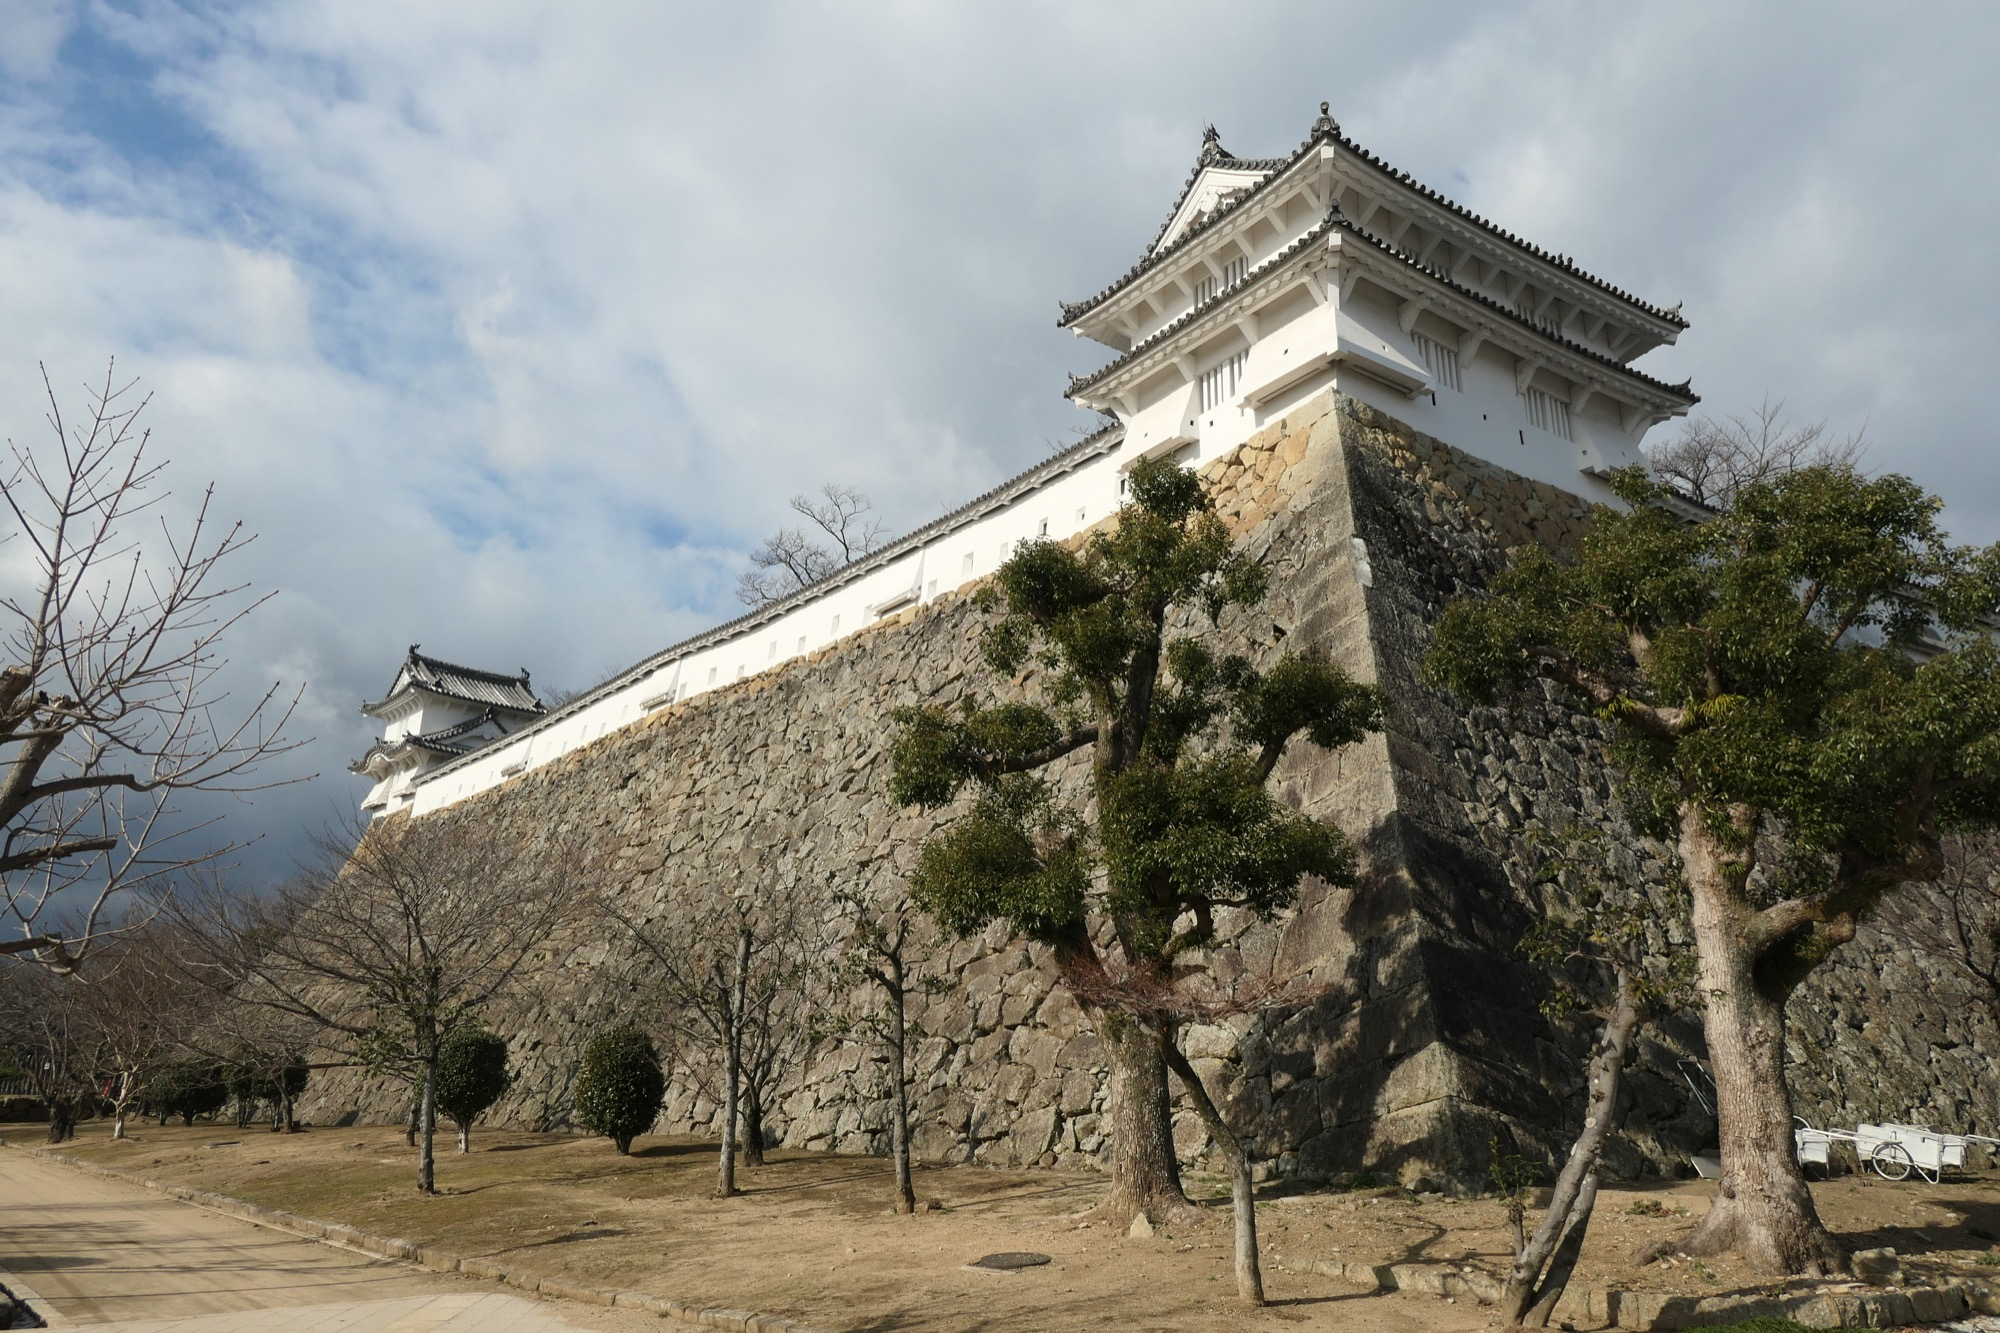 Bailey at Himeji Castle